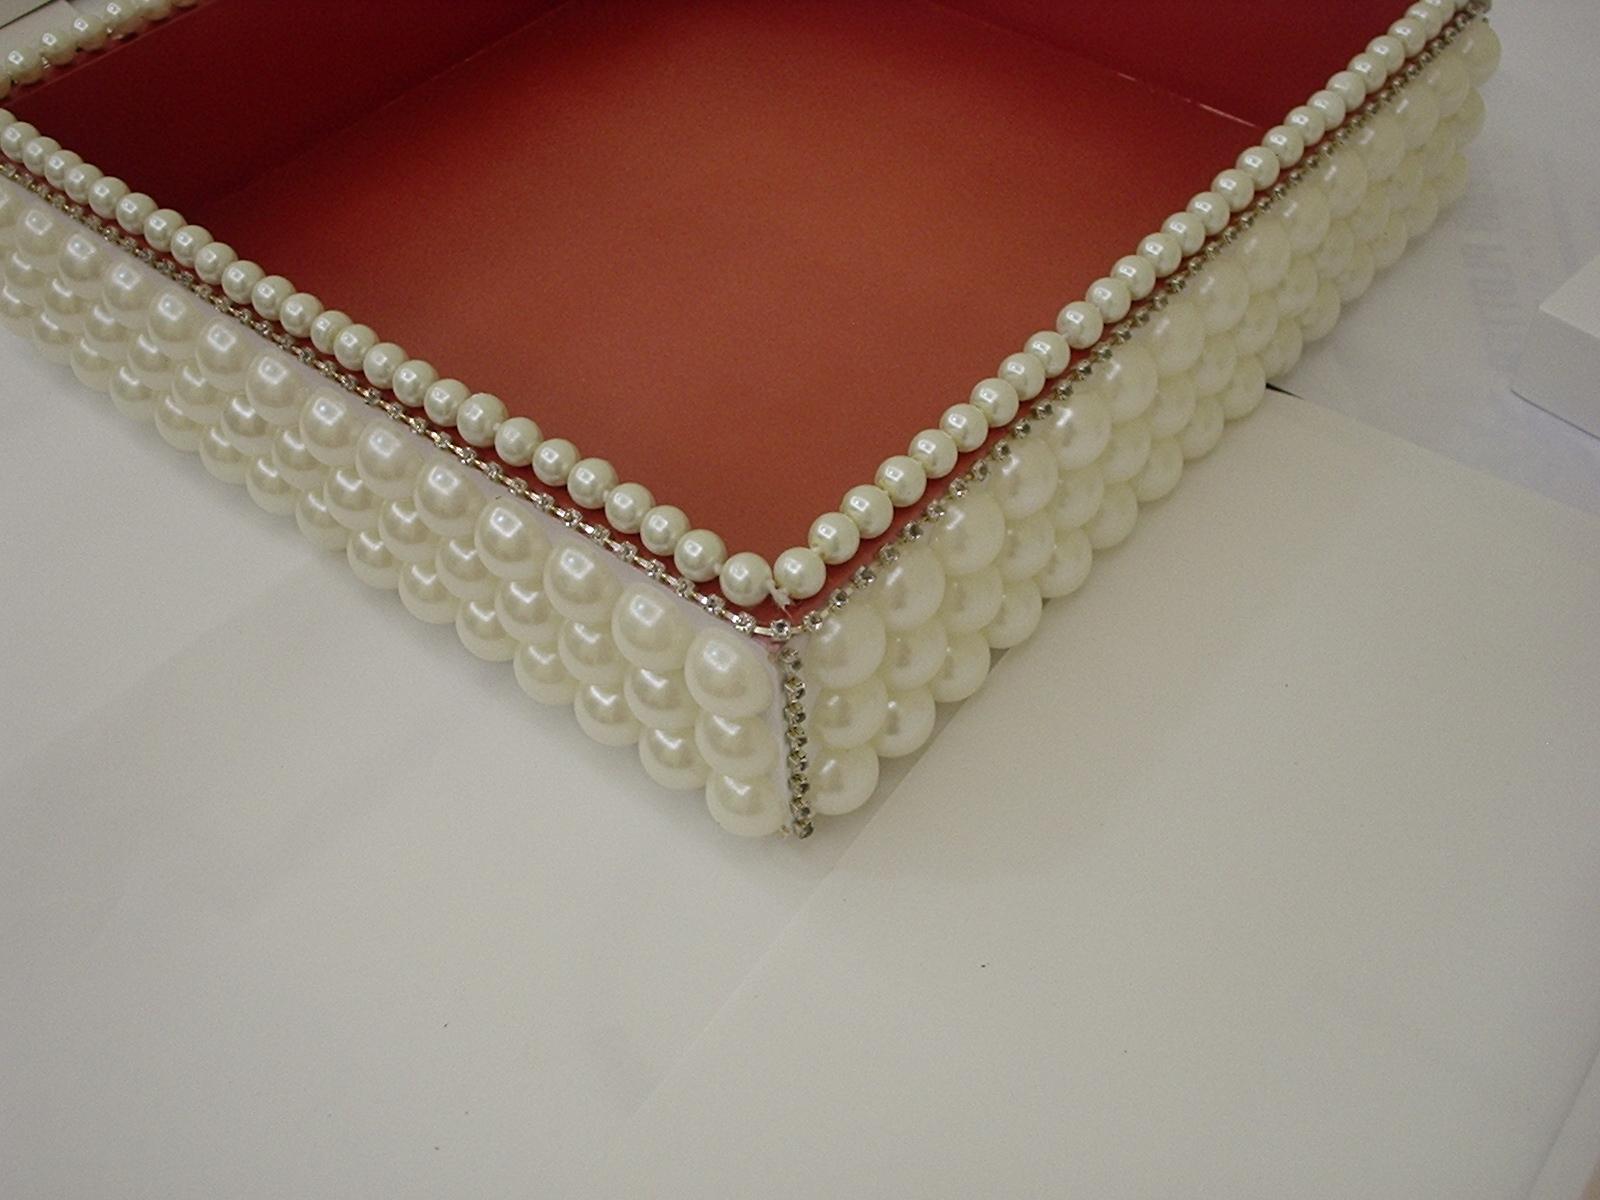 decoracao bandeja lavabo : decoracao bandeja lavabo:lavabo mdf caixa bandeja para toialette lavabo bandeja caixa bandeja